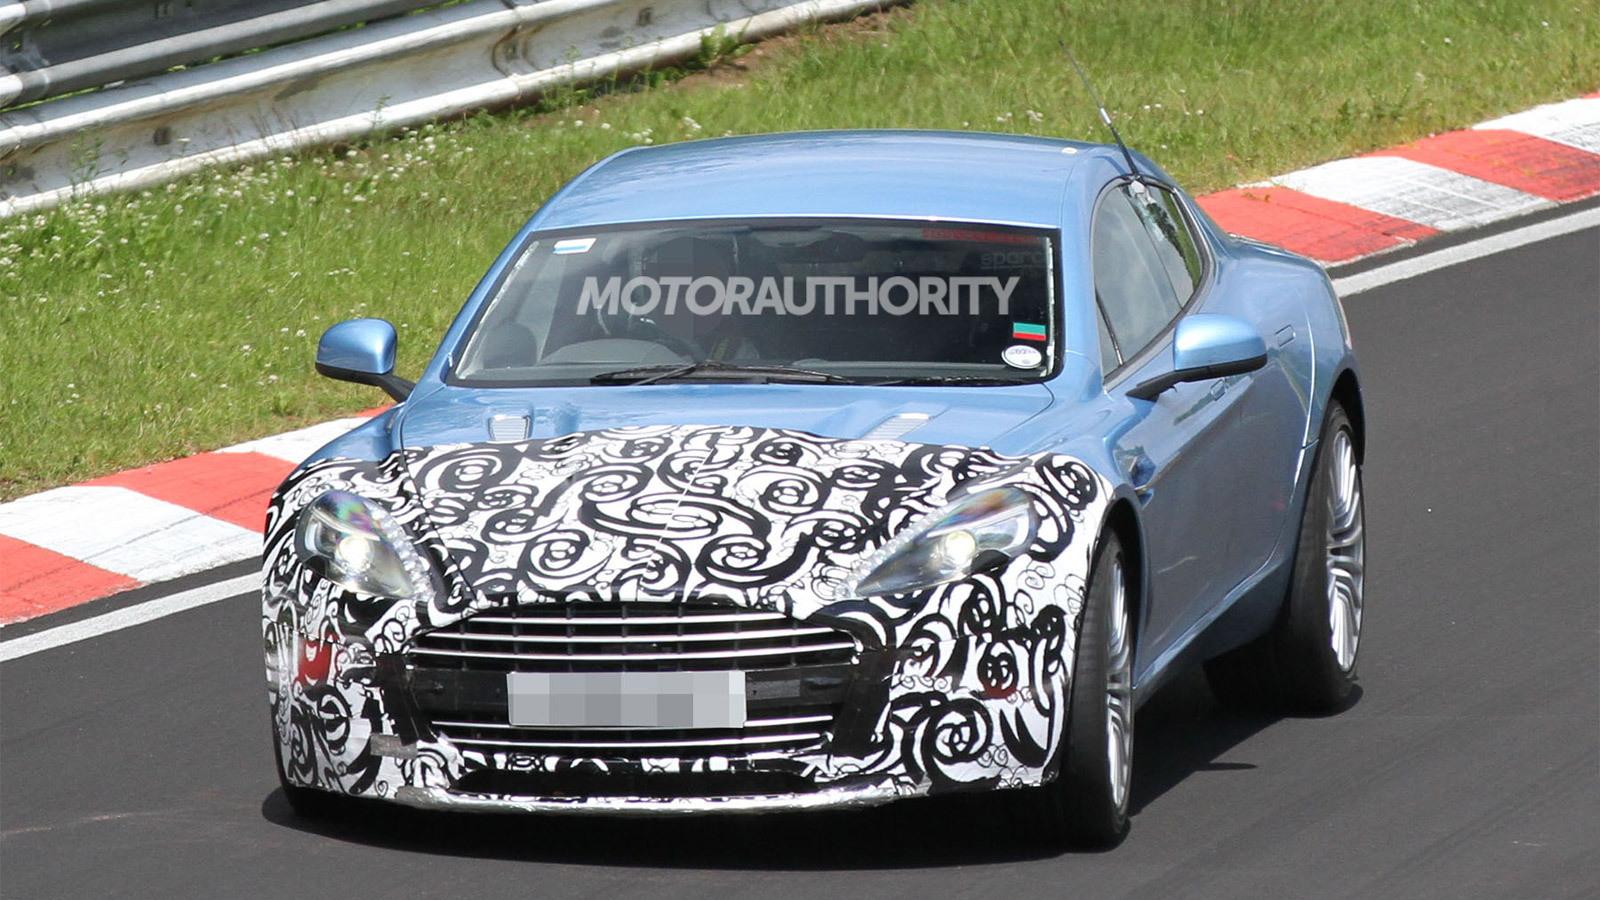 2013 Aston Martin Rapide S spy shots